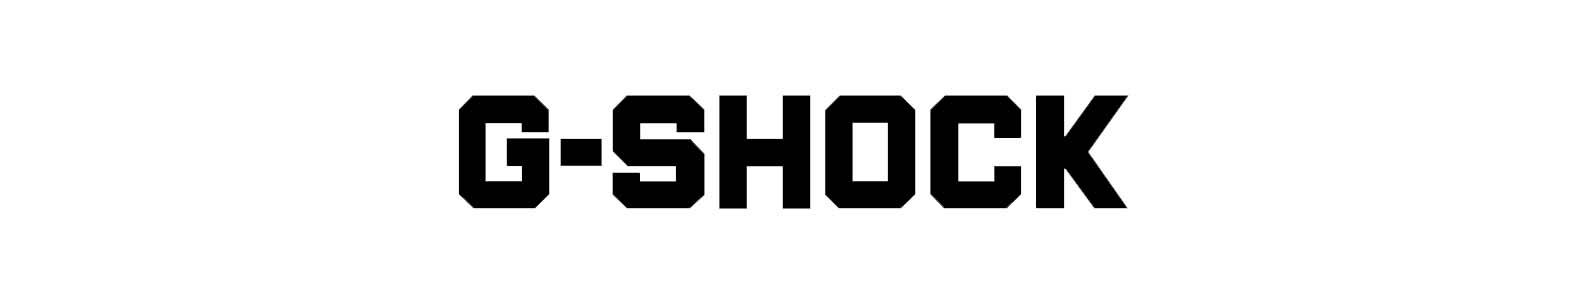 G-Shock brand header image